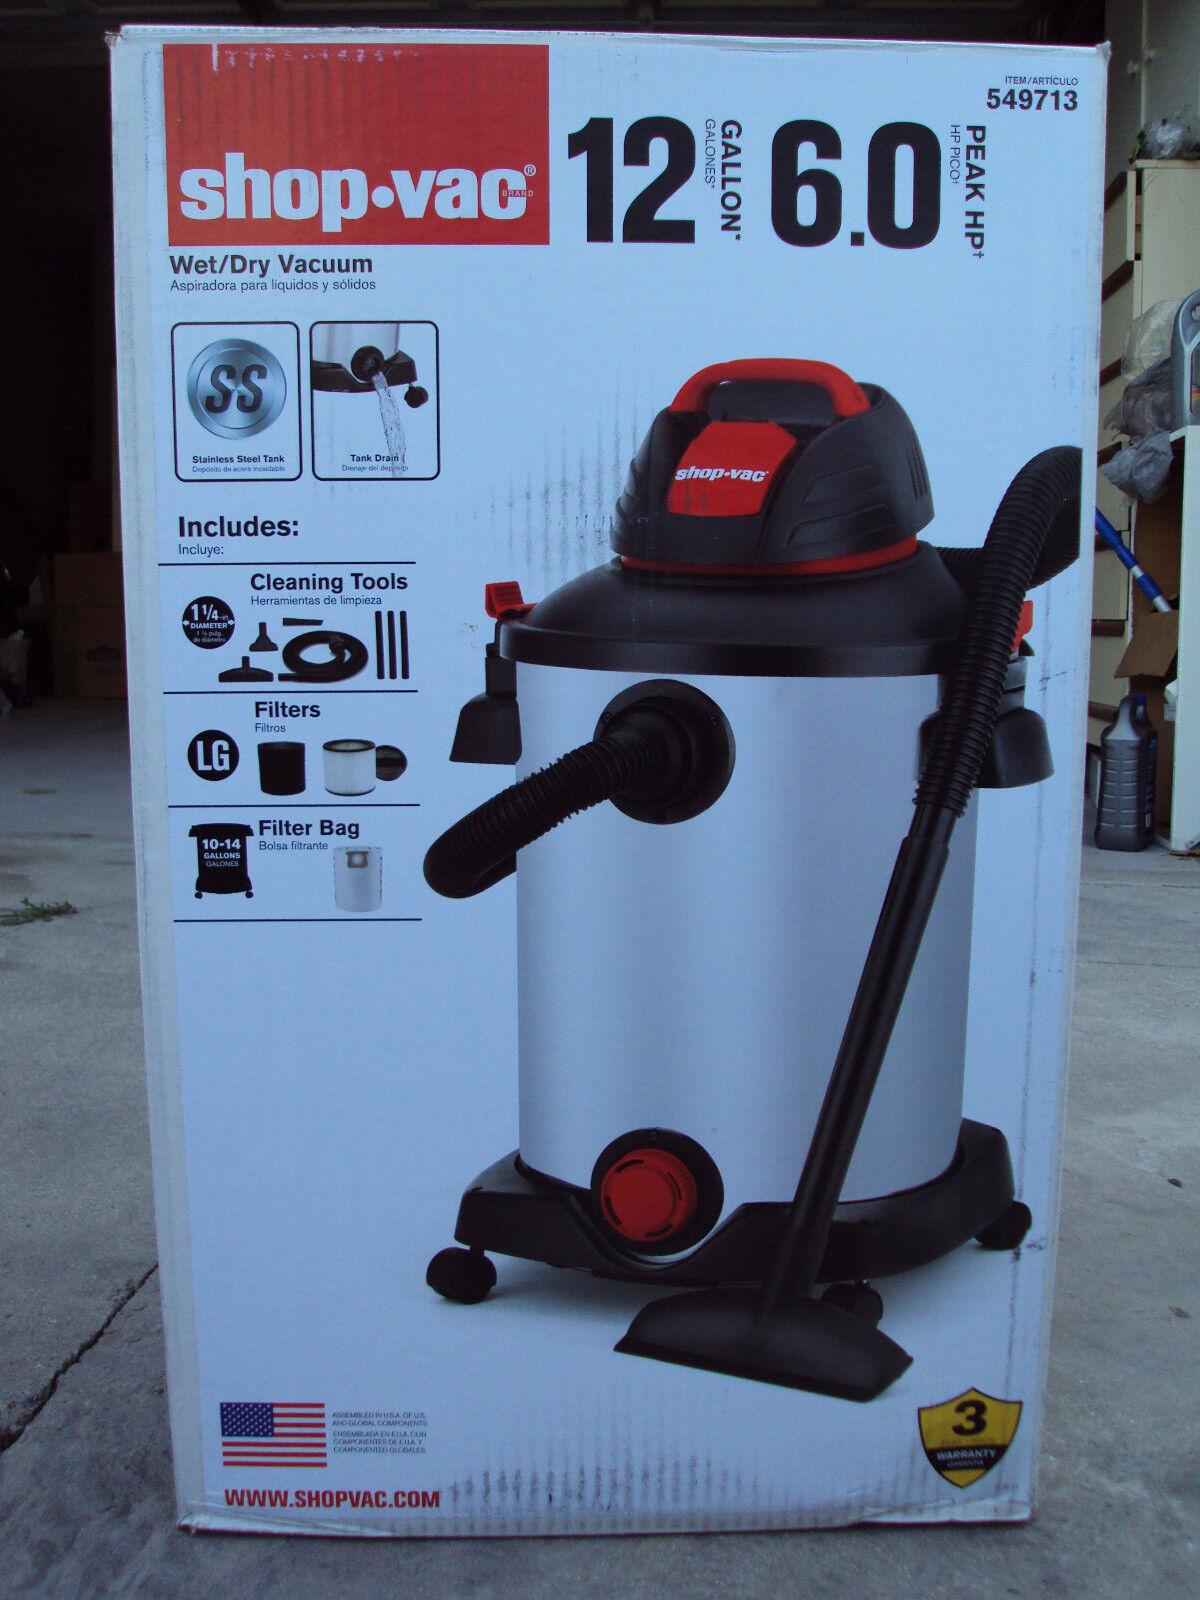 Shop Vac 12 gallon 5.75 peak horse power model